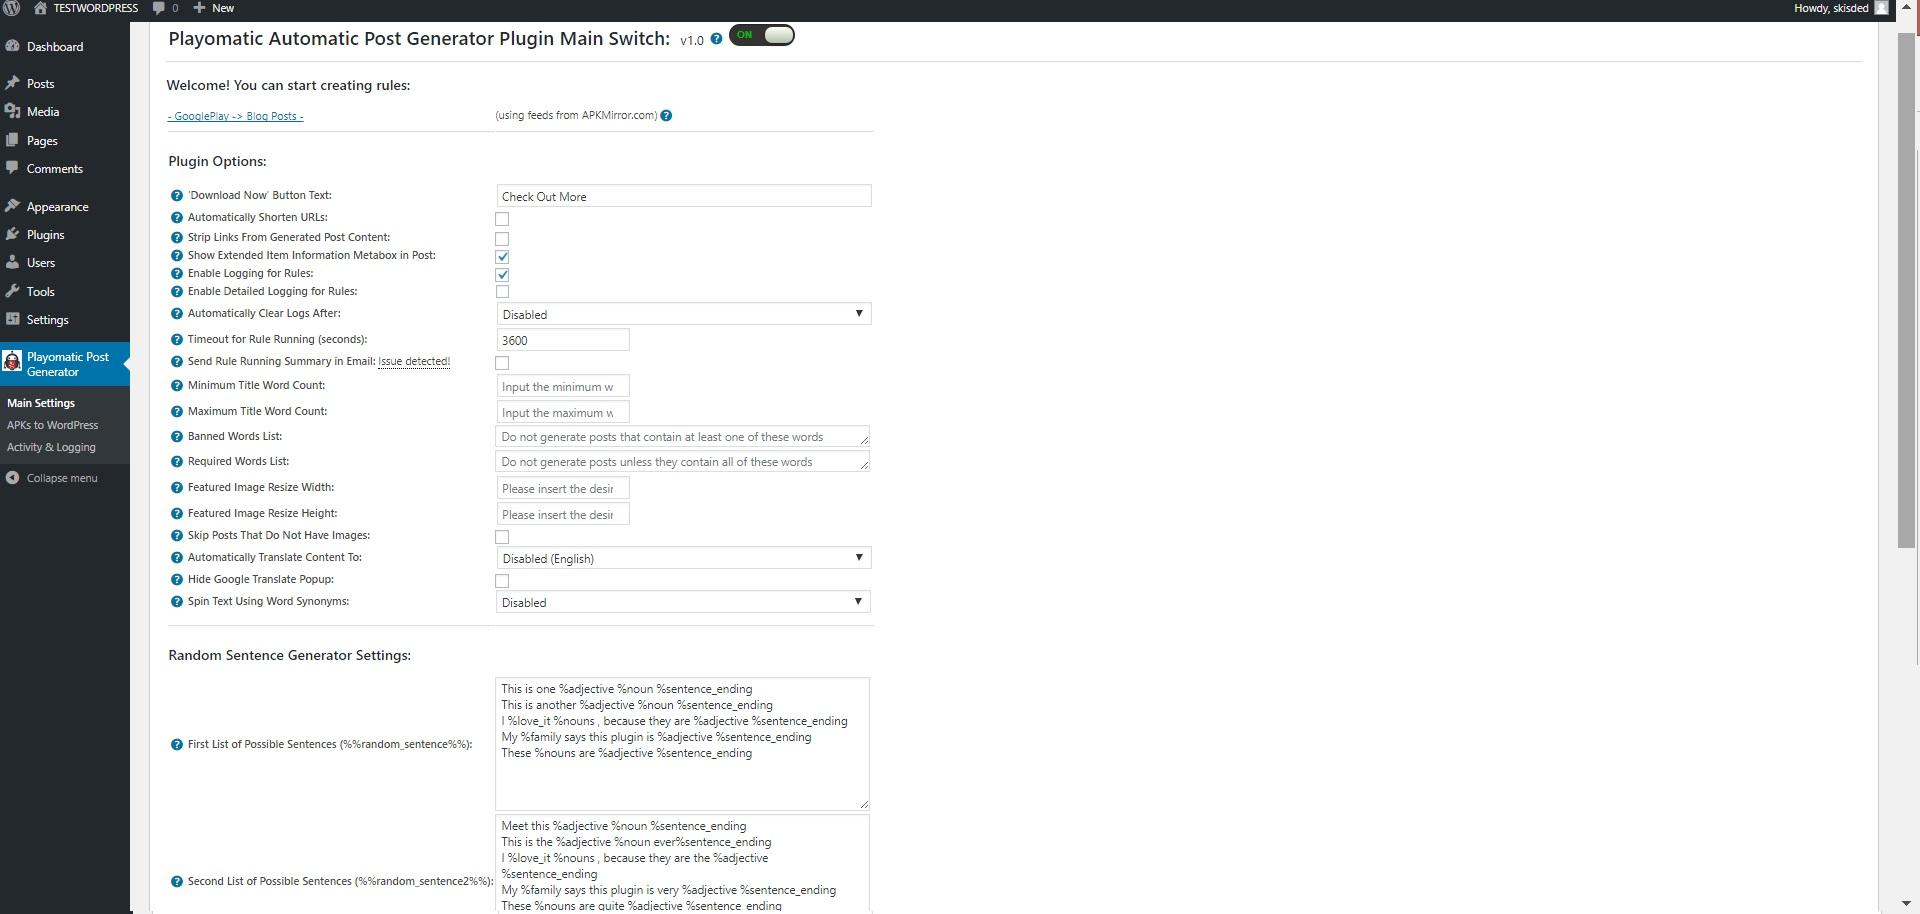 Playomatic - Play Store Automatic Post Generator Plugin for WordPress